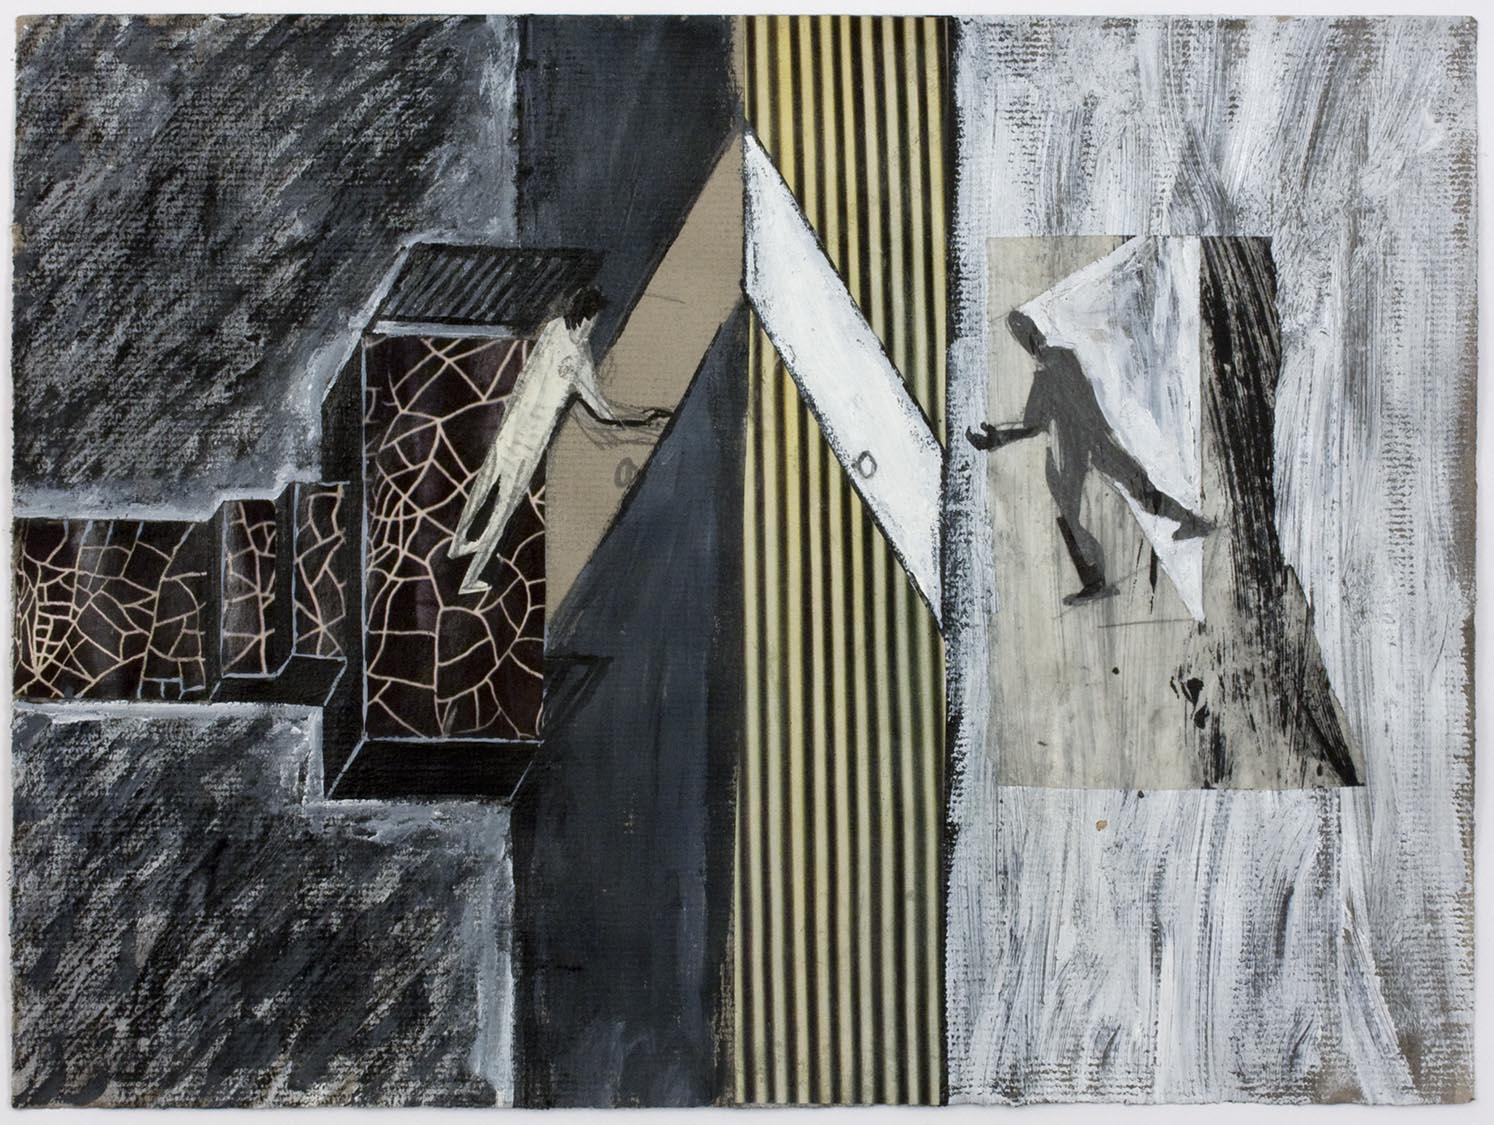 Autour d'une porte (Around A Door), 1988